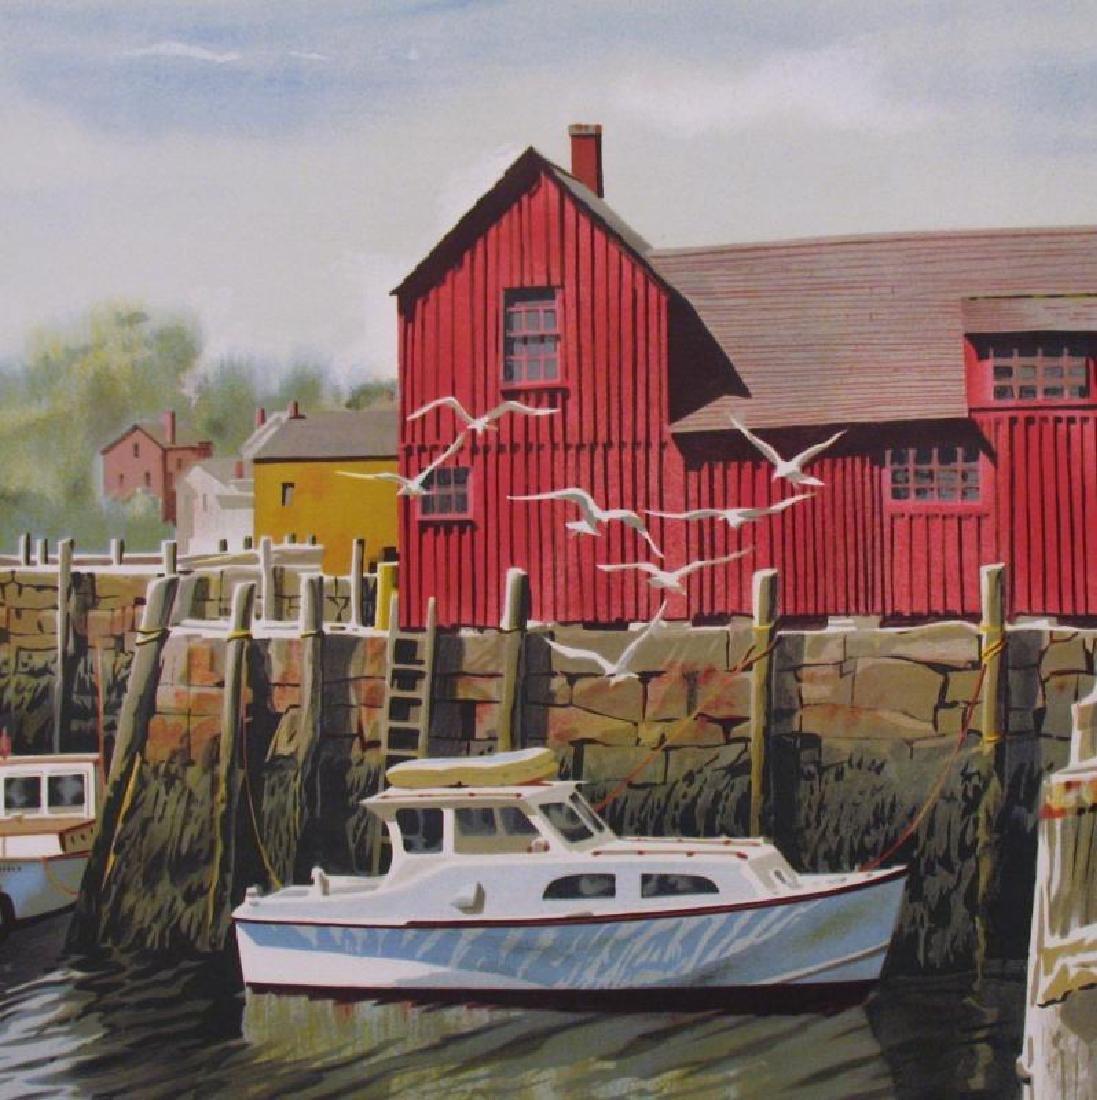 Boat Nautical Red Barn Scene Landscape Ltd Ed Art - 2